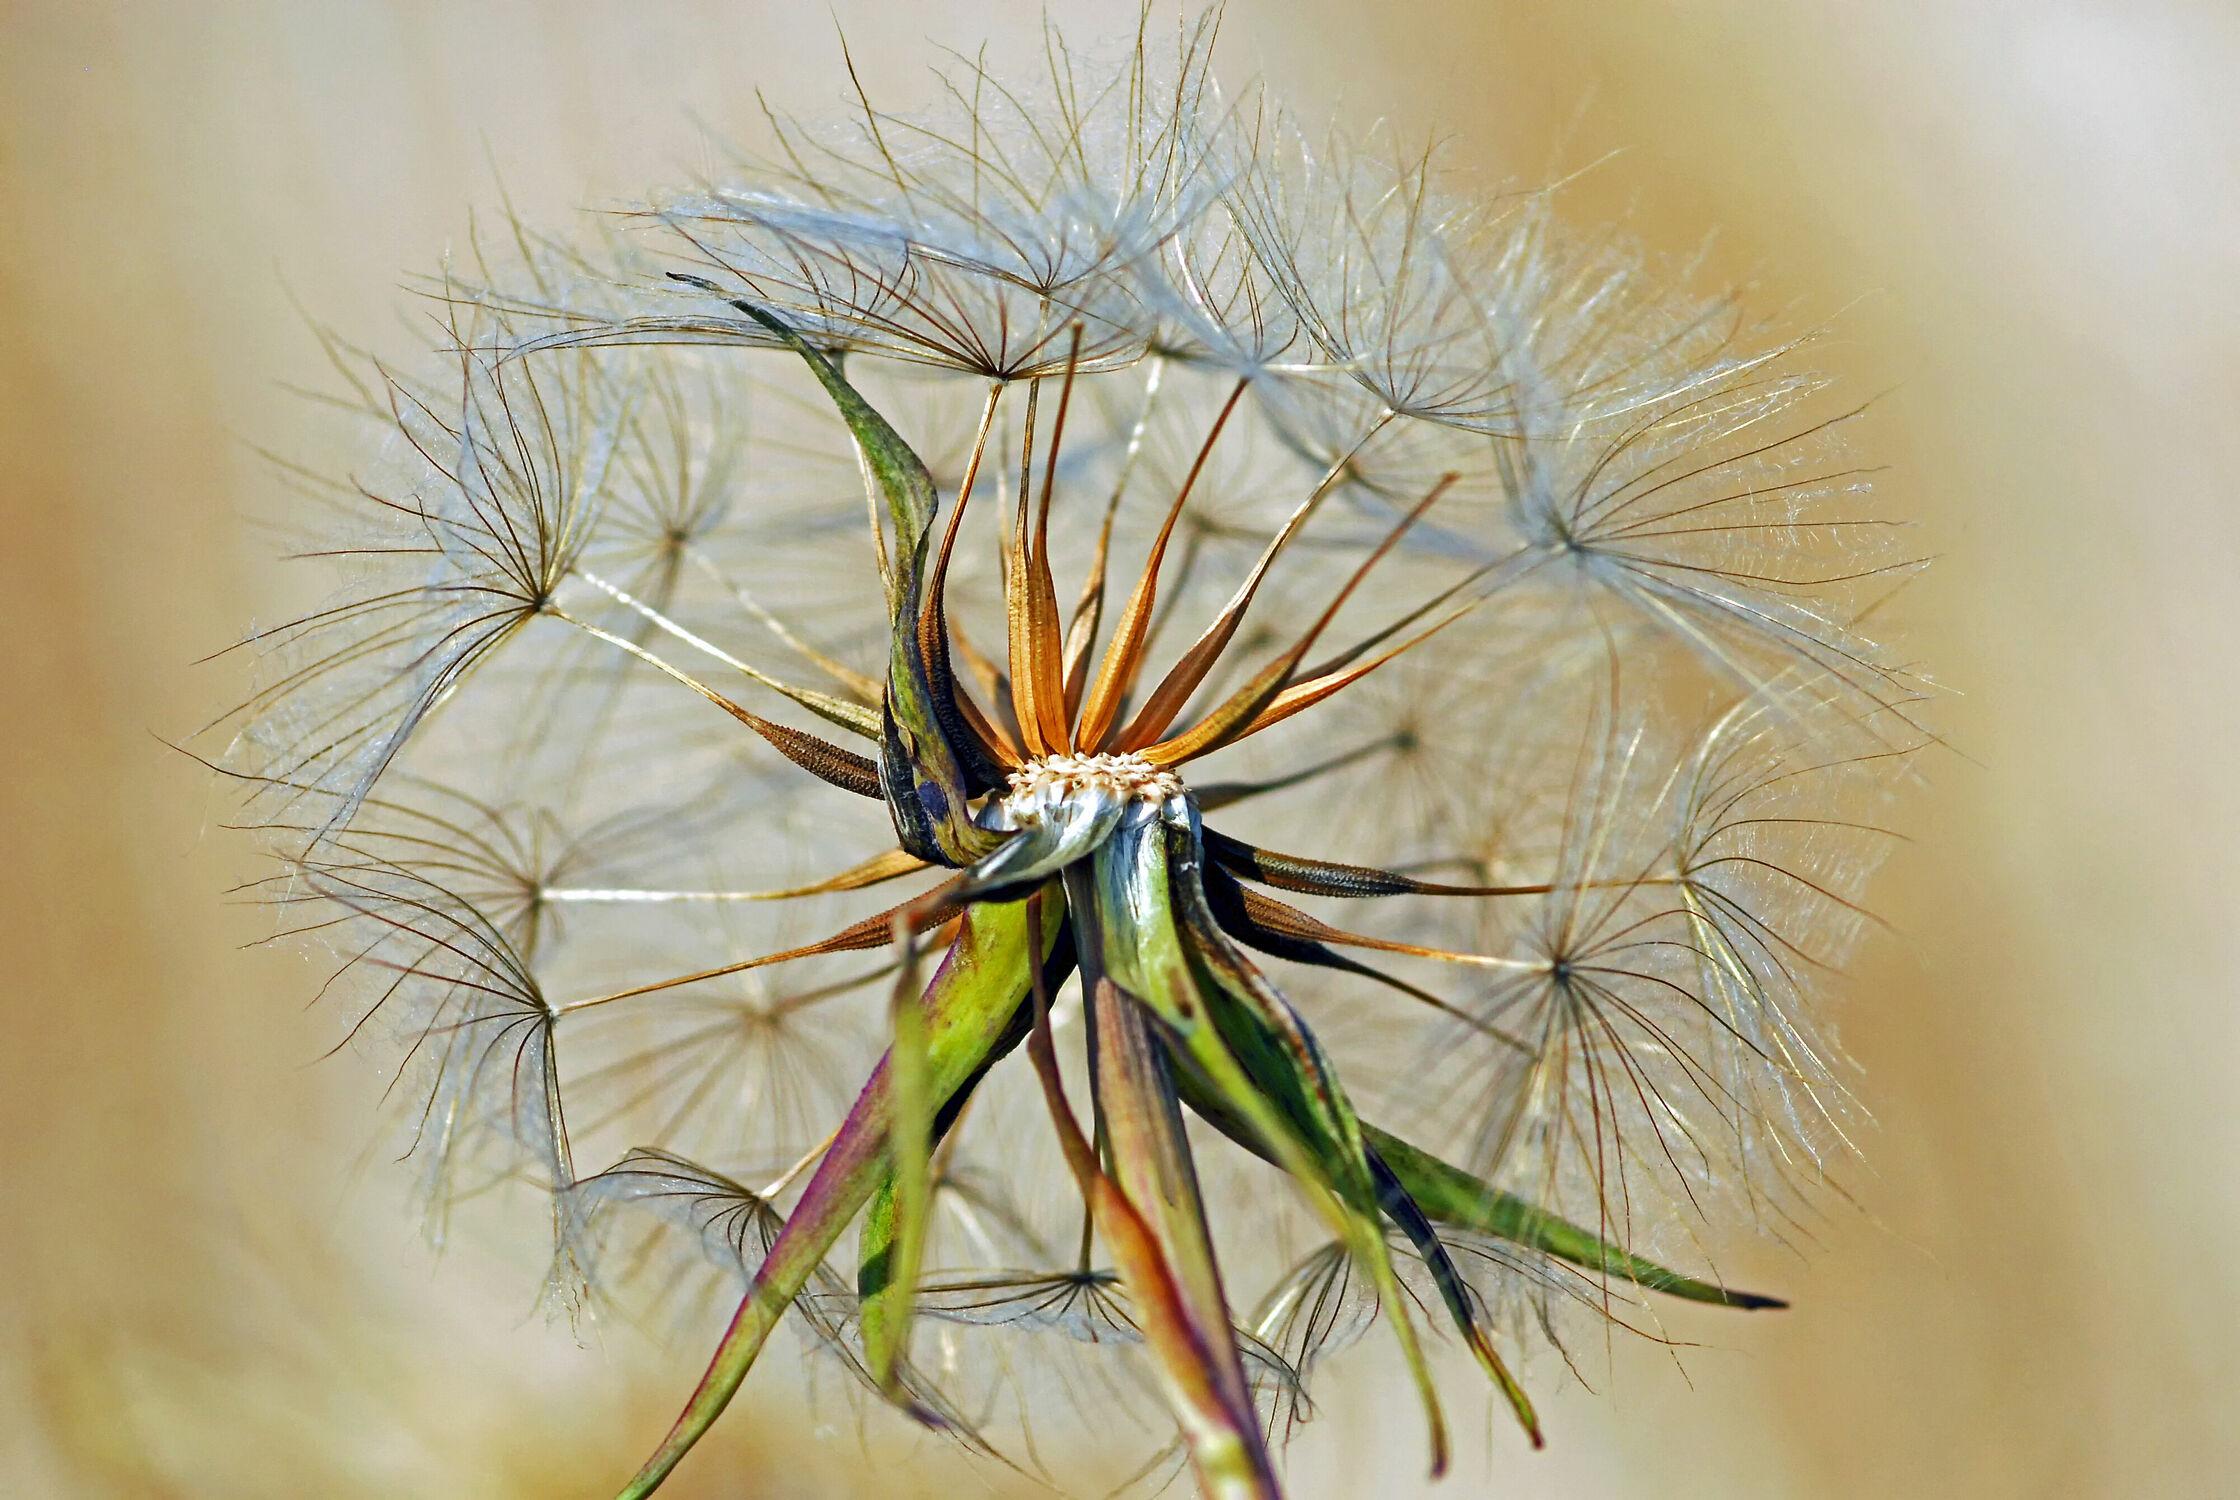 Bild mit Pflanzen, Makro, Pusteblume, Felder, garten, nahaufnahme, Wiesen, Idylle, Wind, zart